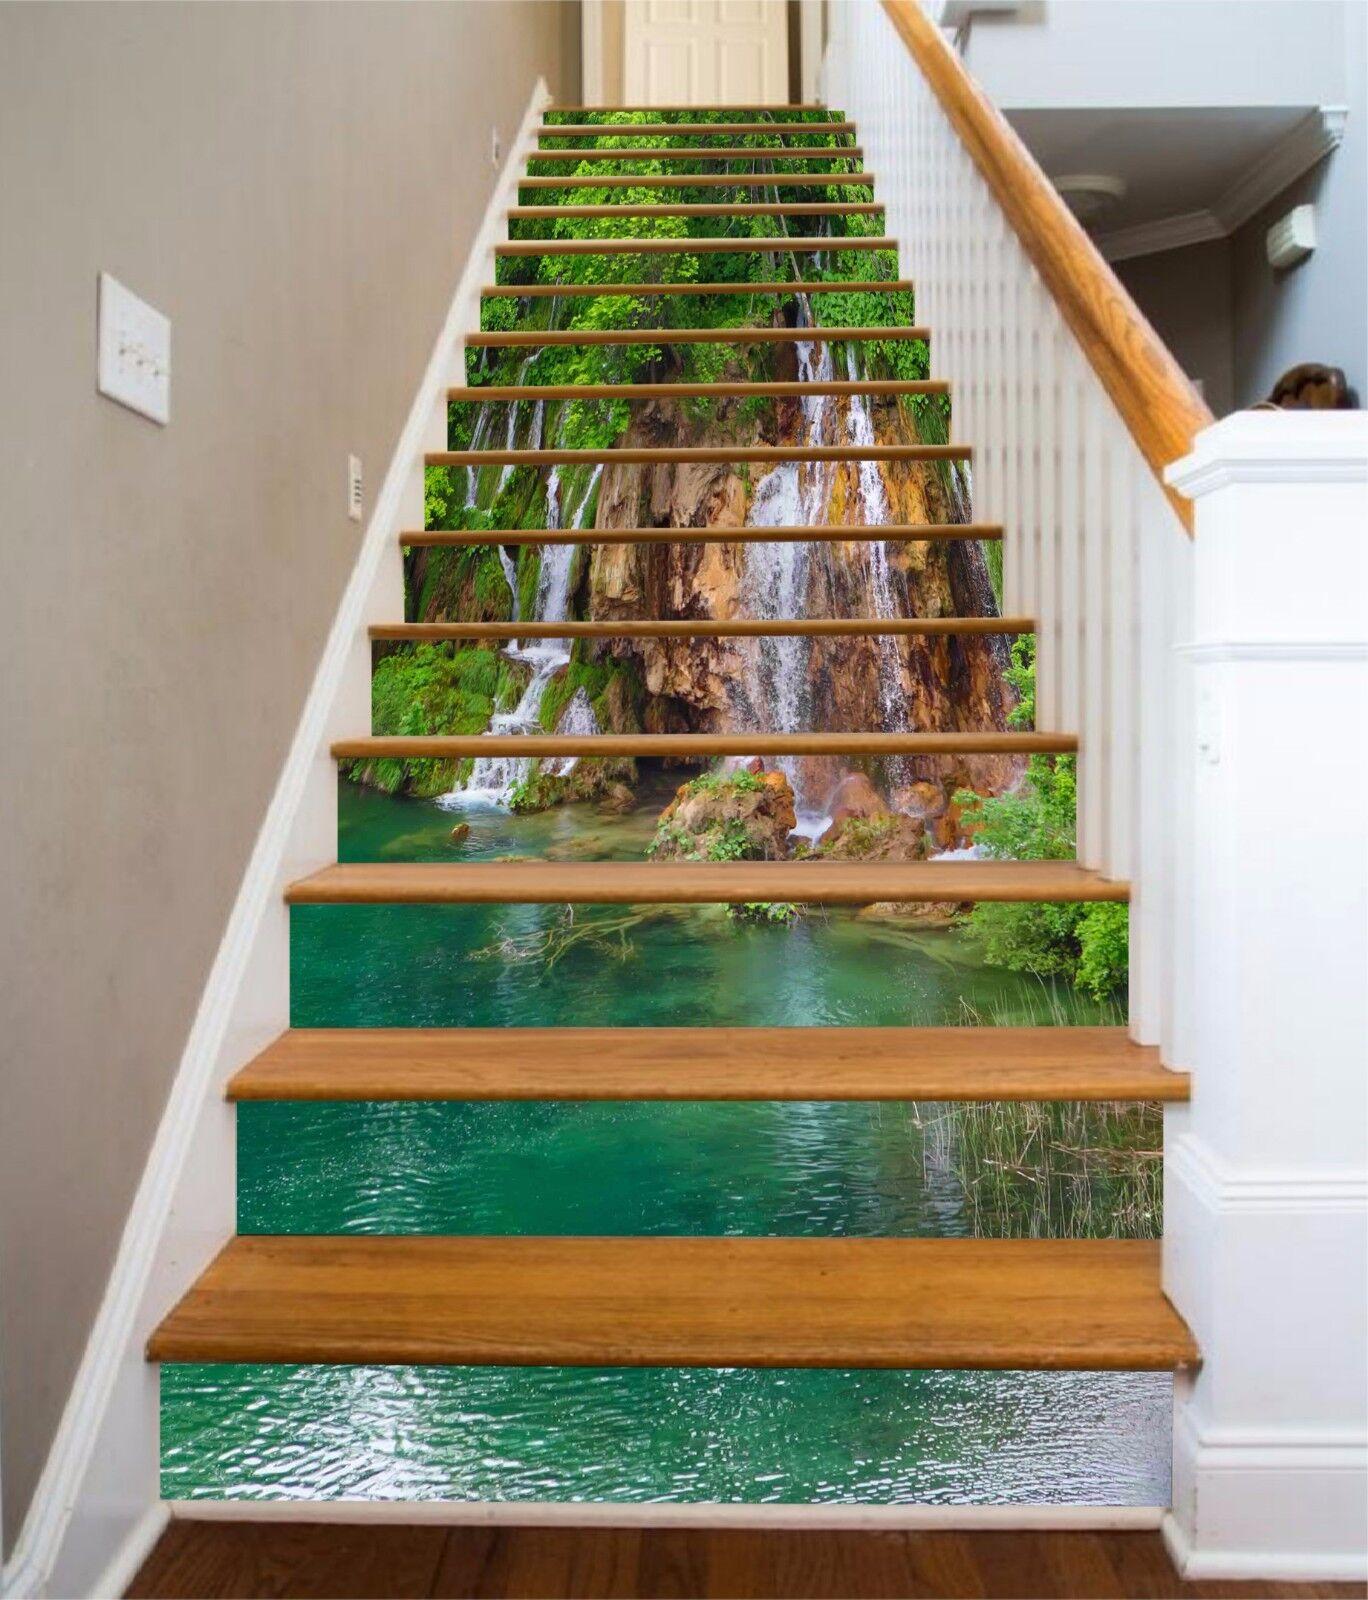 3D Stone Lake 332 Stair Risers Decoration Photo Mural Vinyl Decal Wallpaper UK